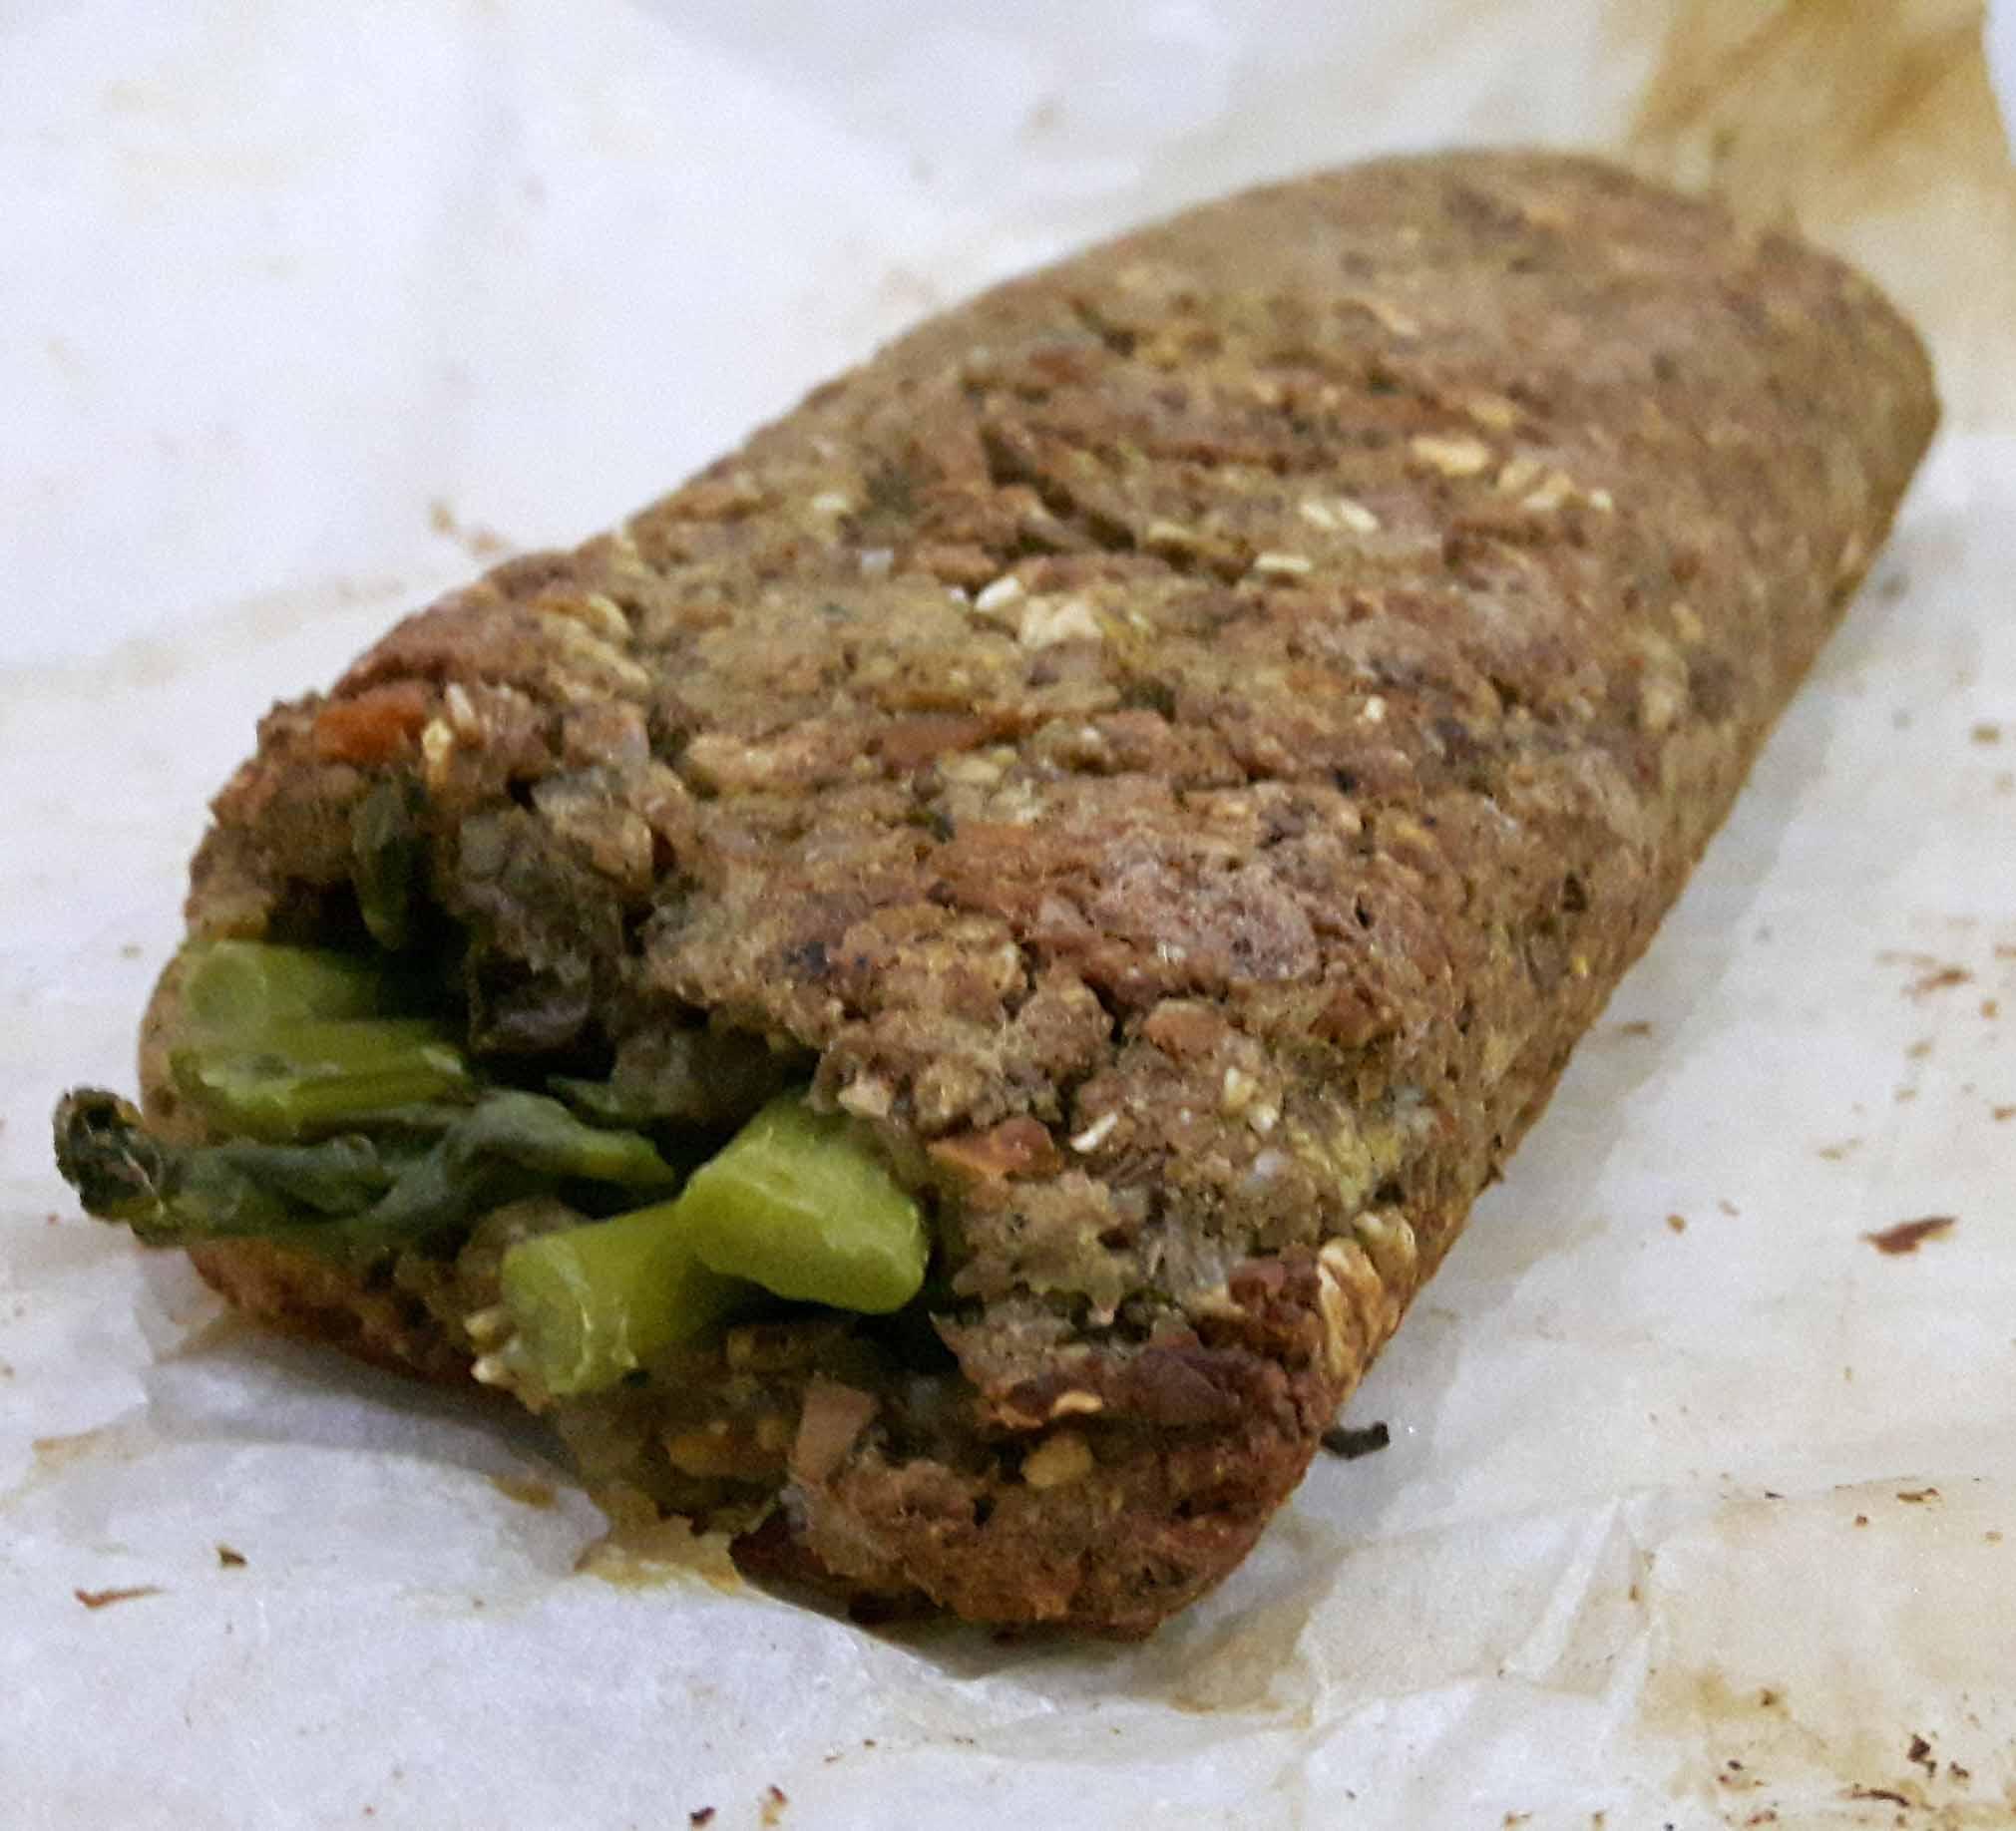 Polpettone di lenticchie e asparagiOriginally Posted on 8 June 2017 and reposted on 18 June 2020